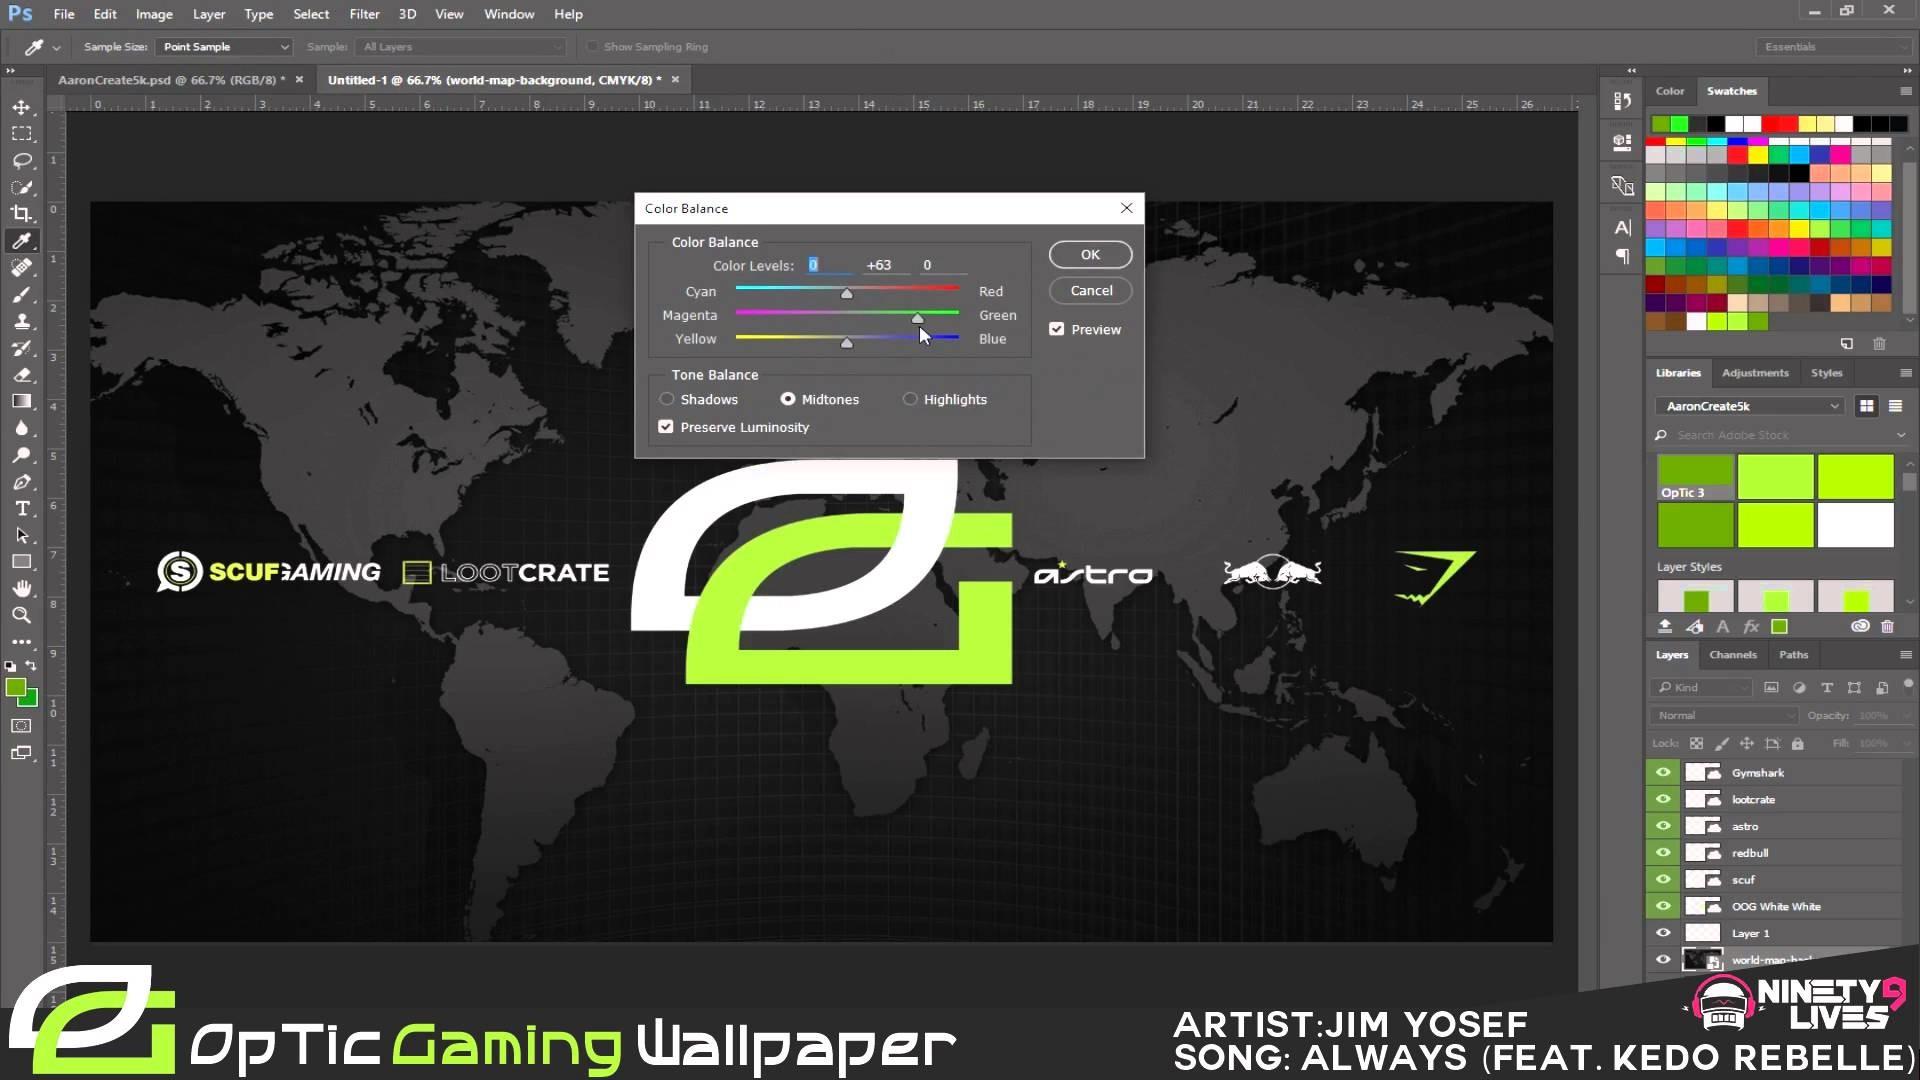 Speed Art | OpTic Gaming Wallpaper